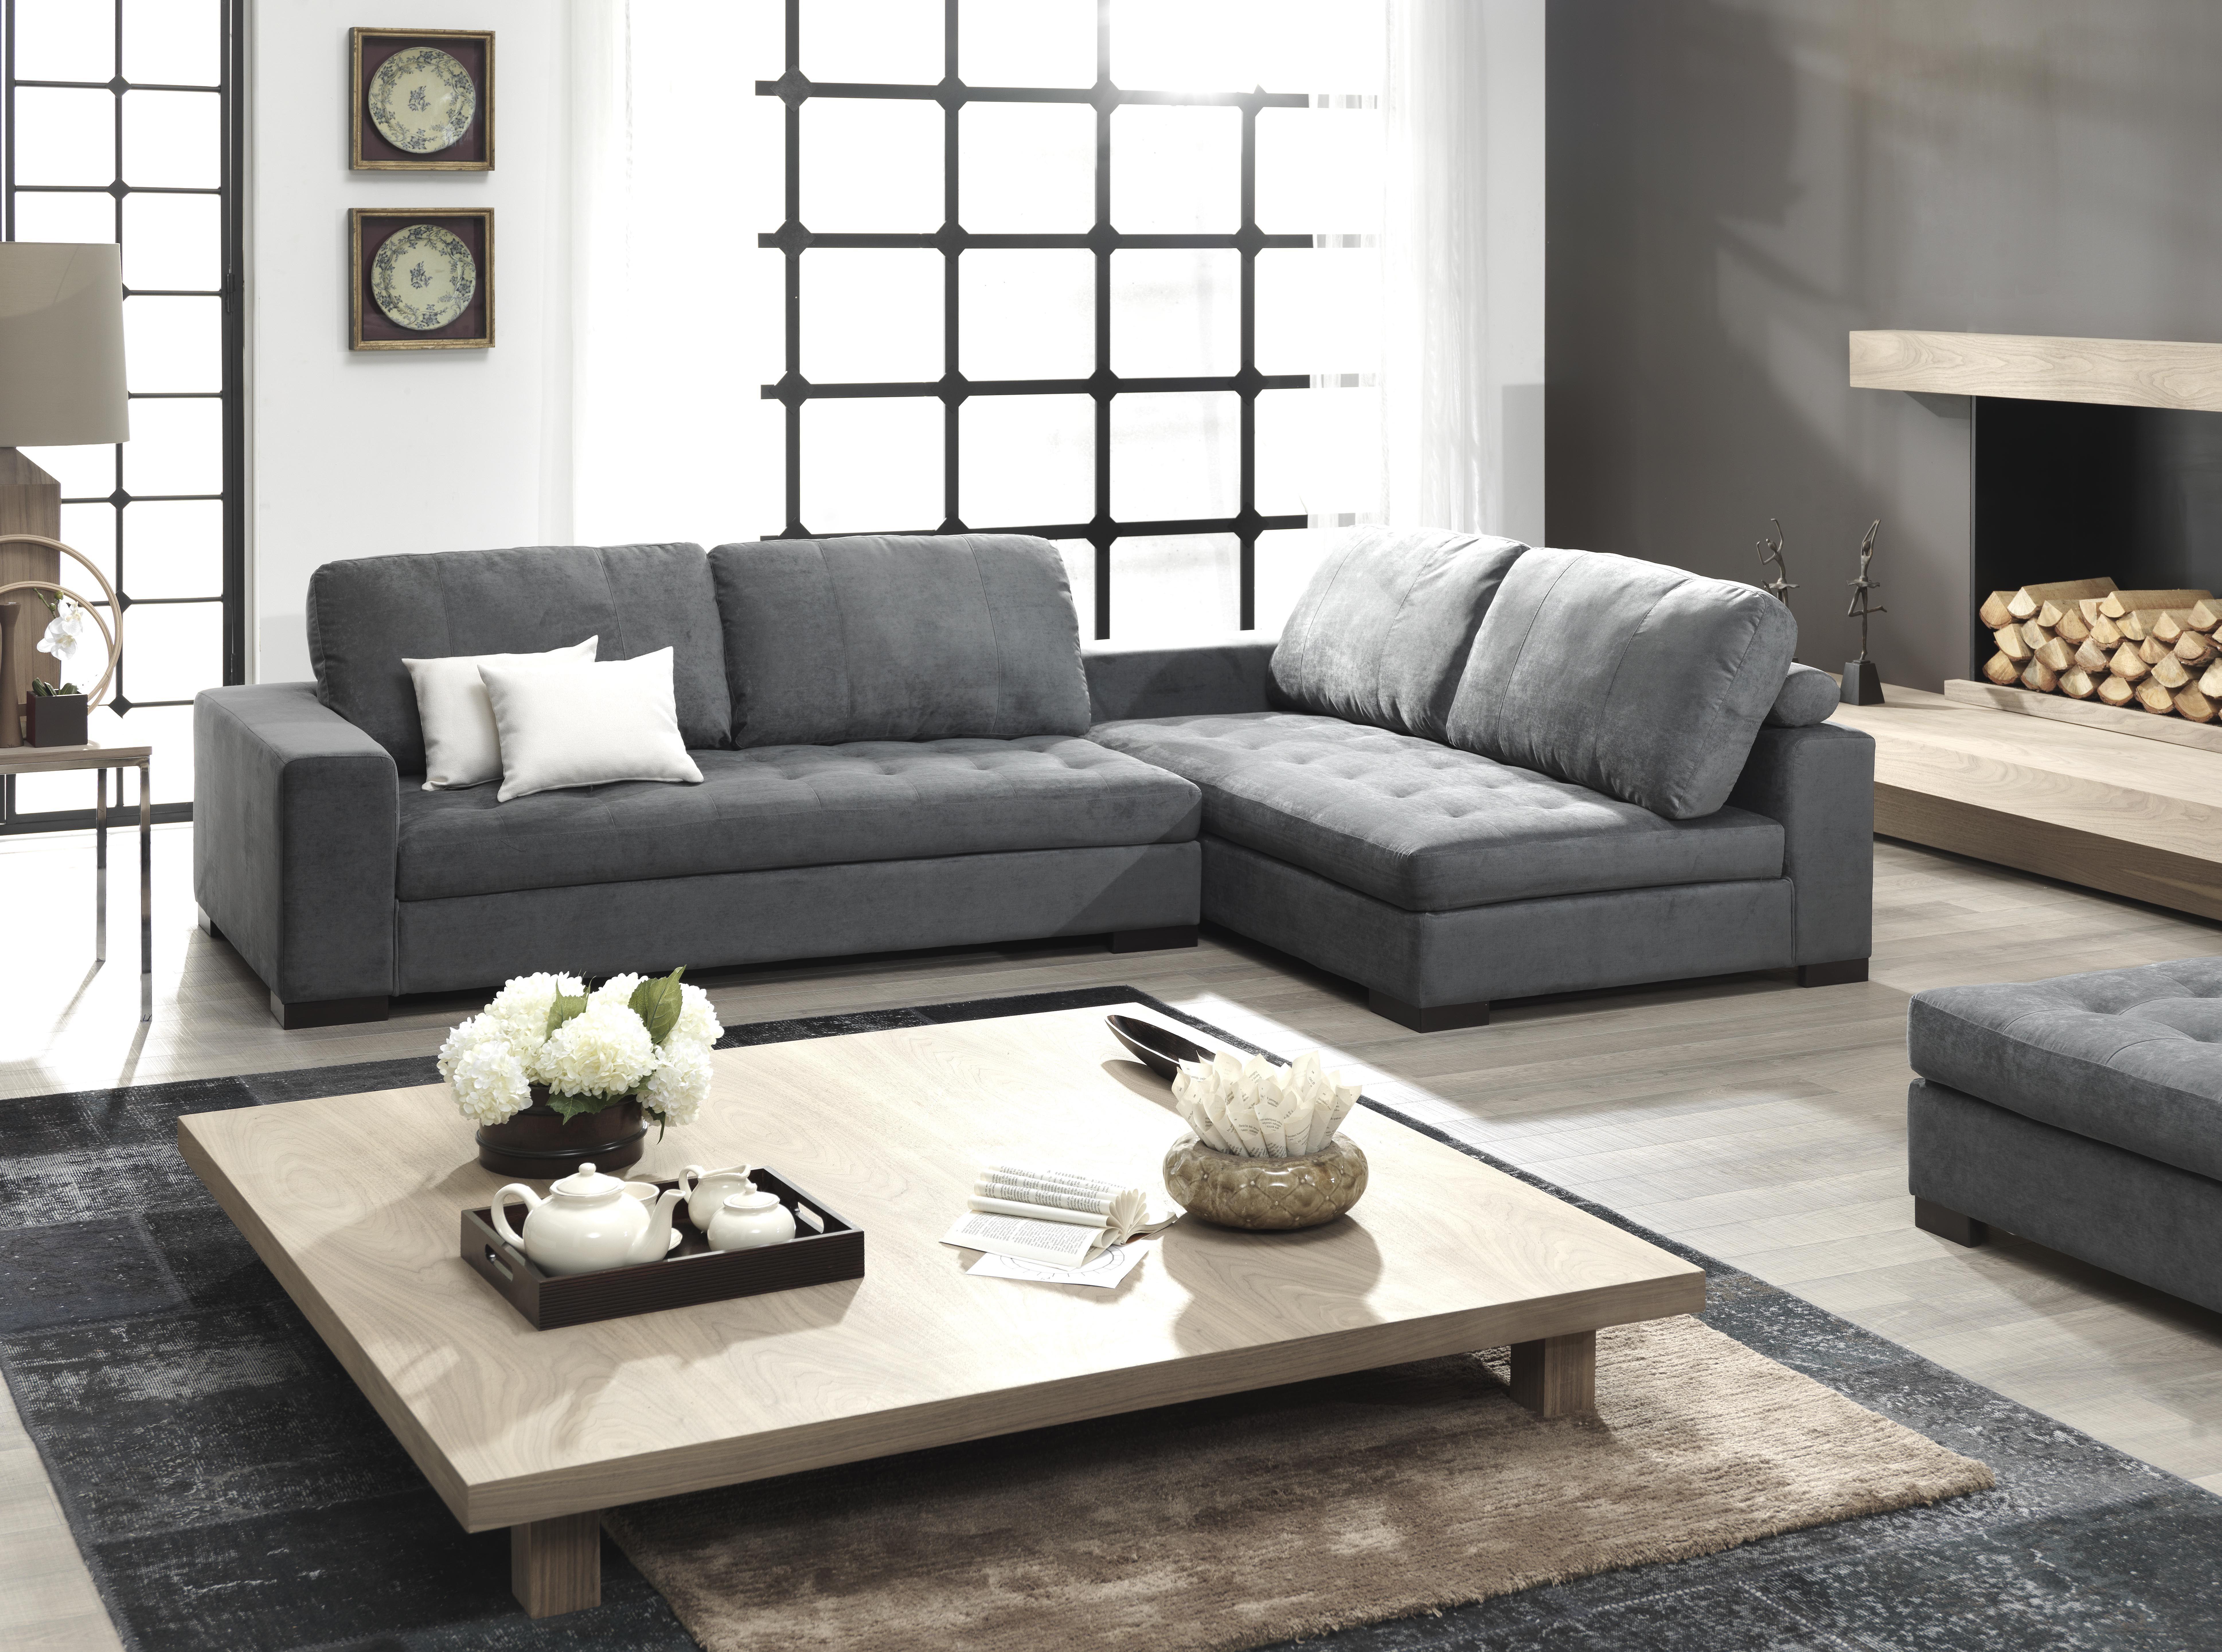 Melman Koltuk Takimi Tepehome Furniture Mobilya Dekorasyon Fikirleri